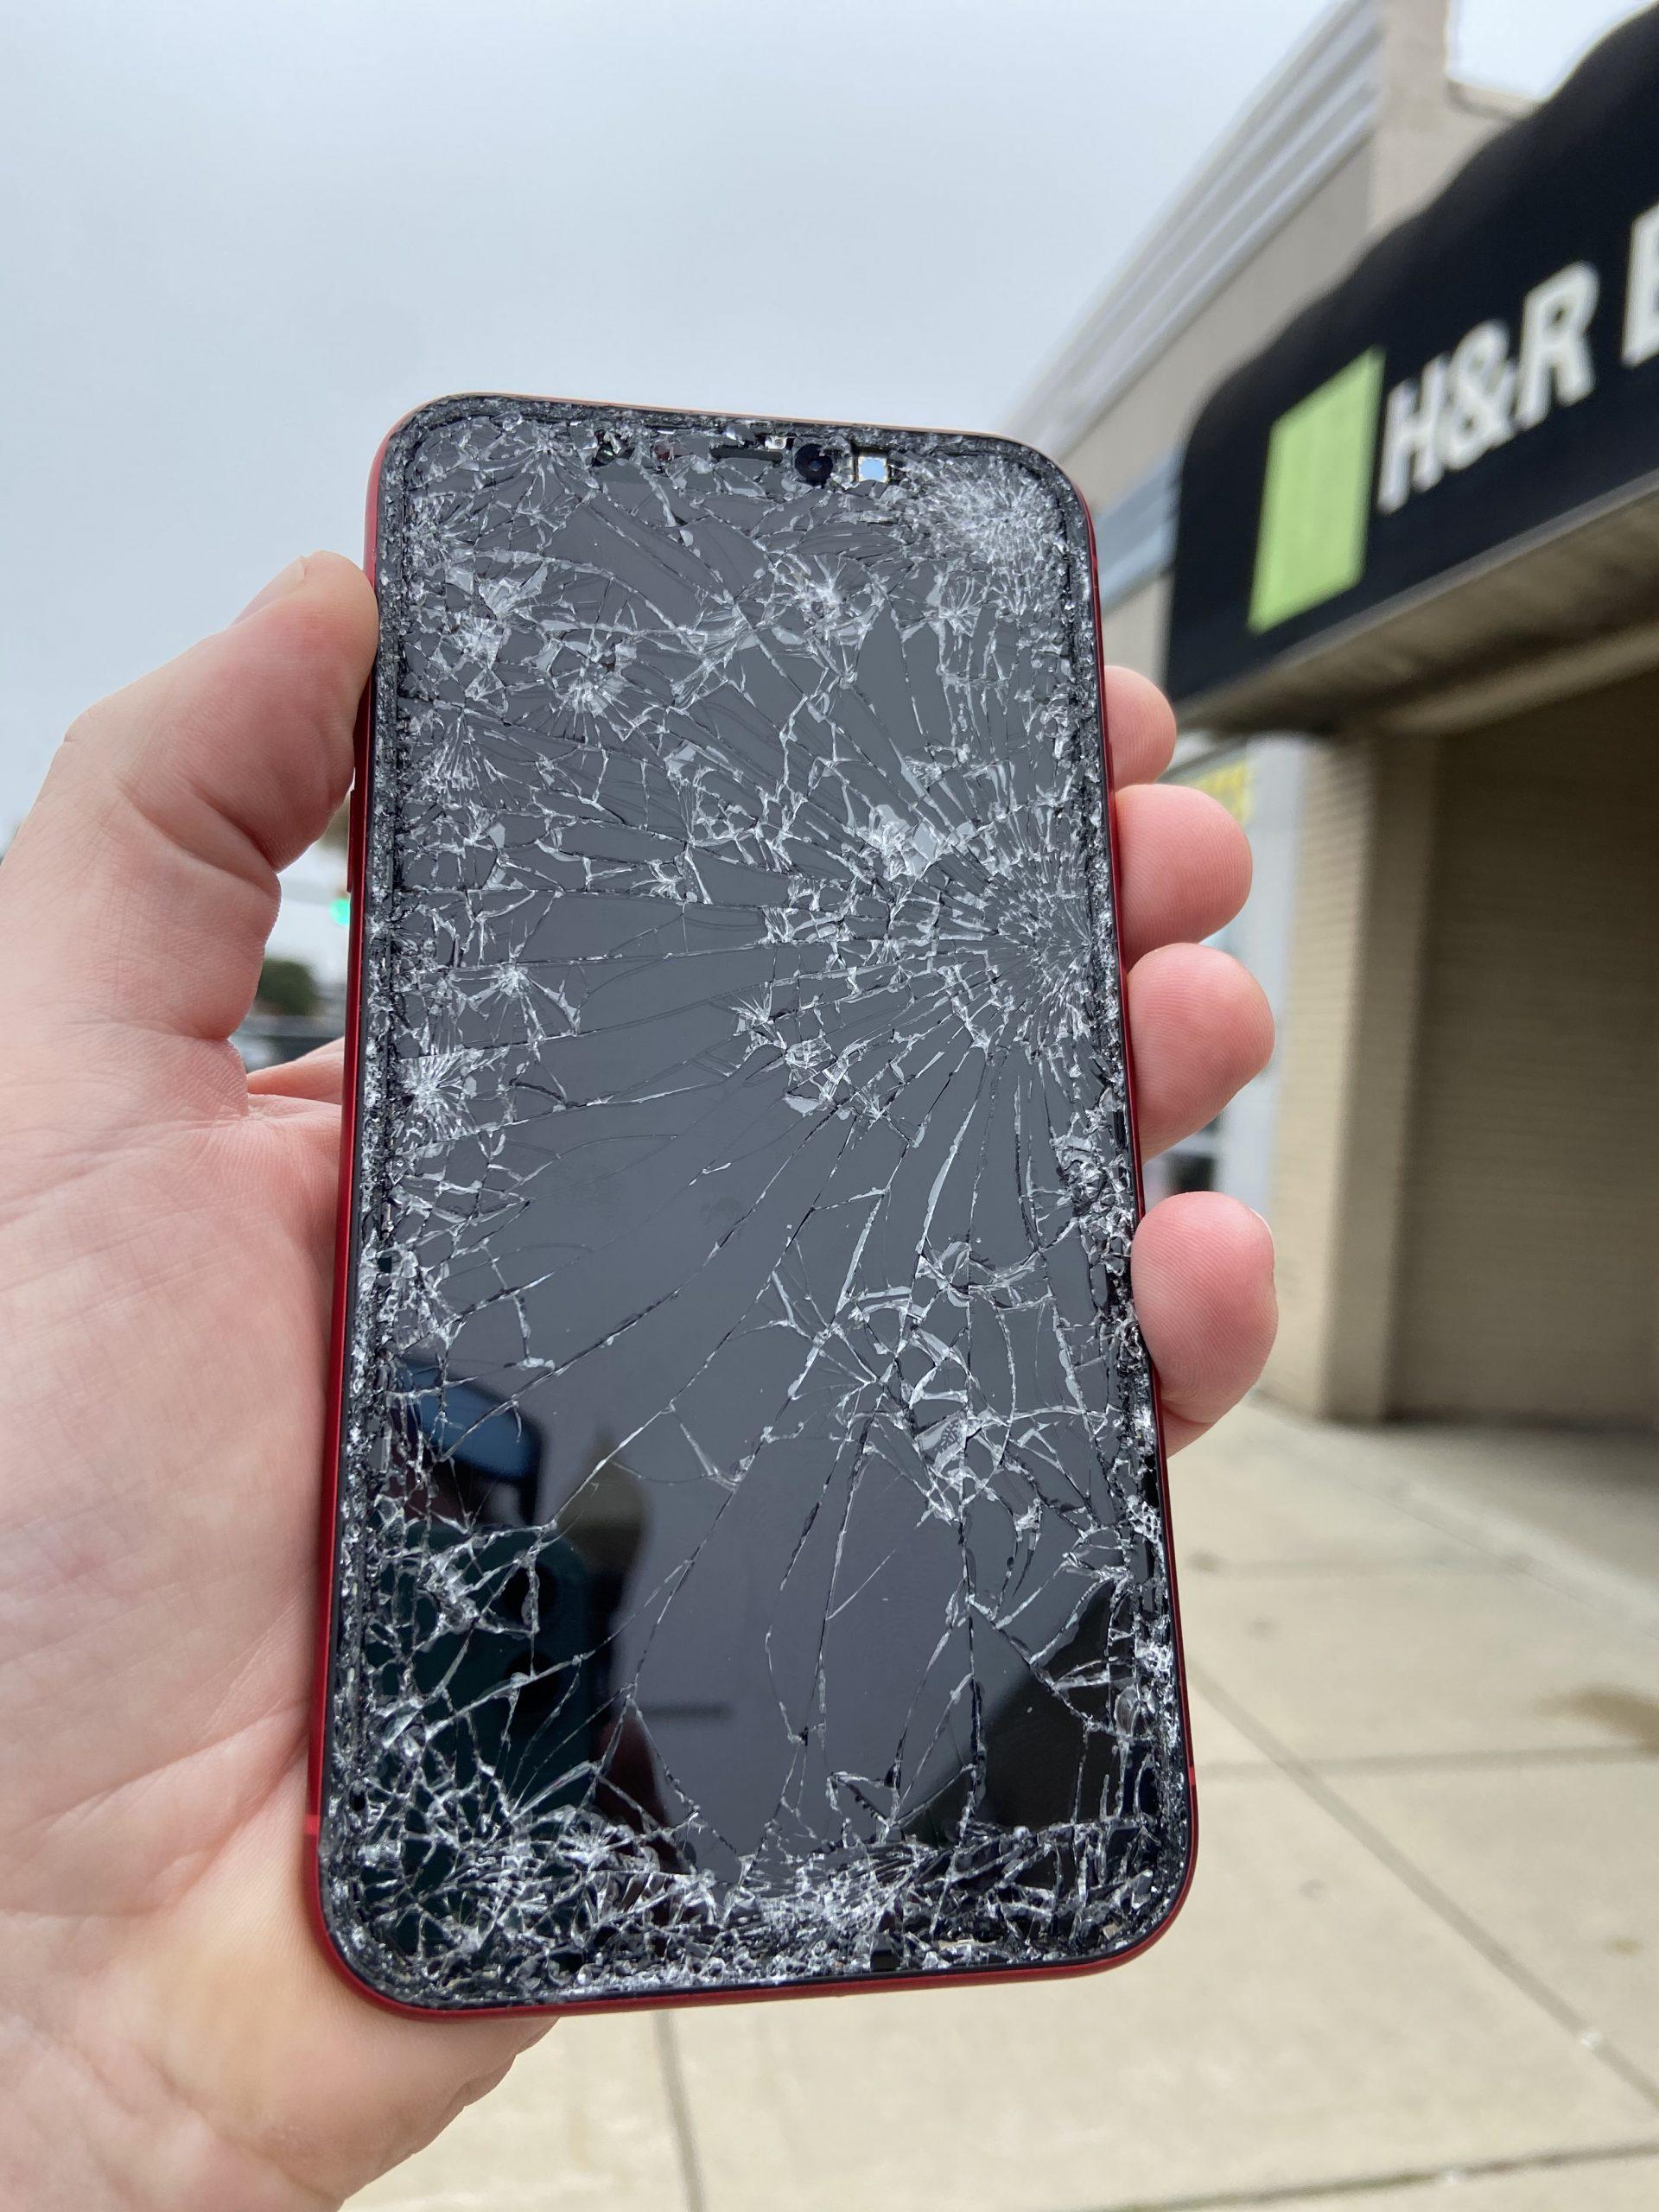 cracked iphone 11 screen